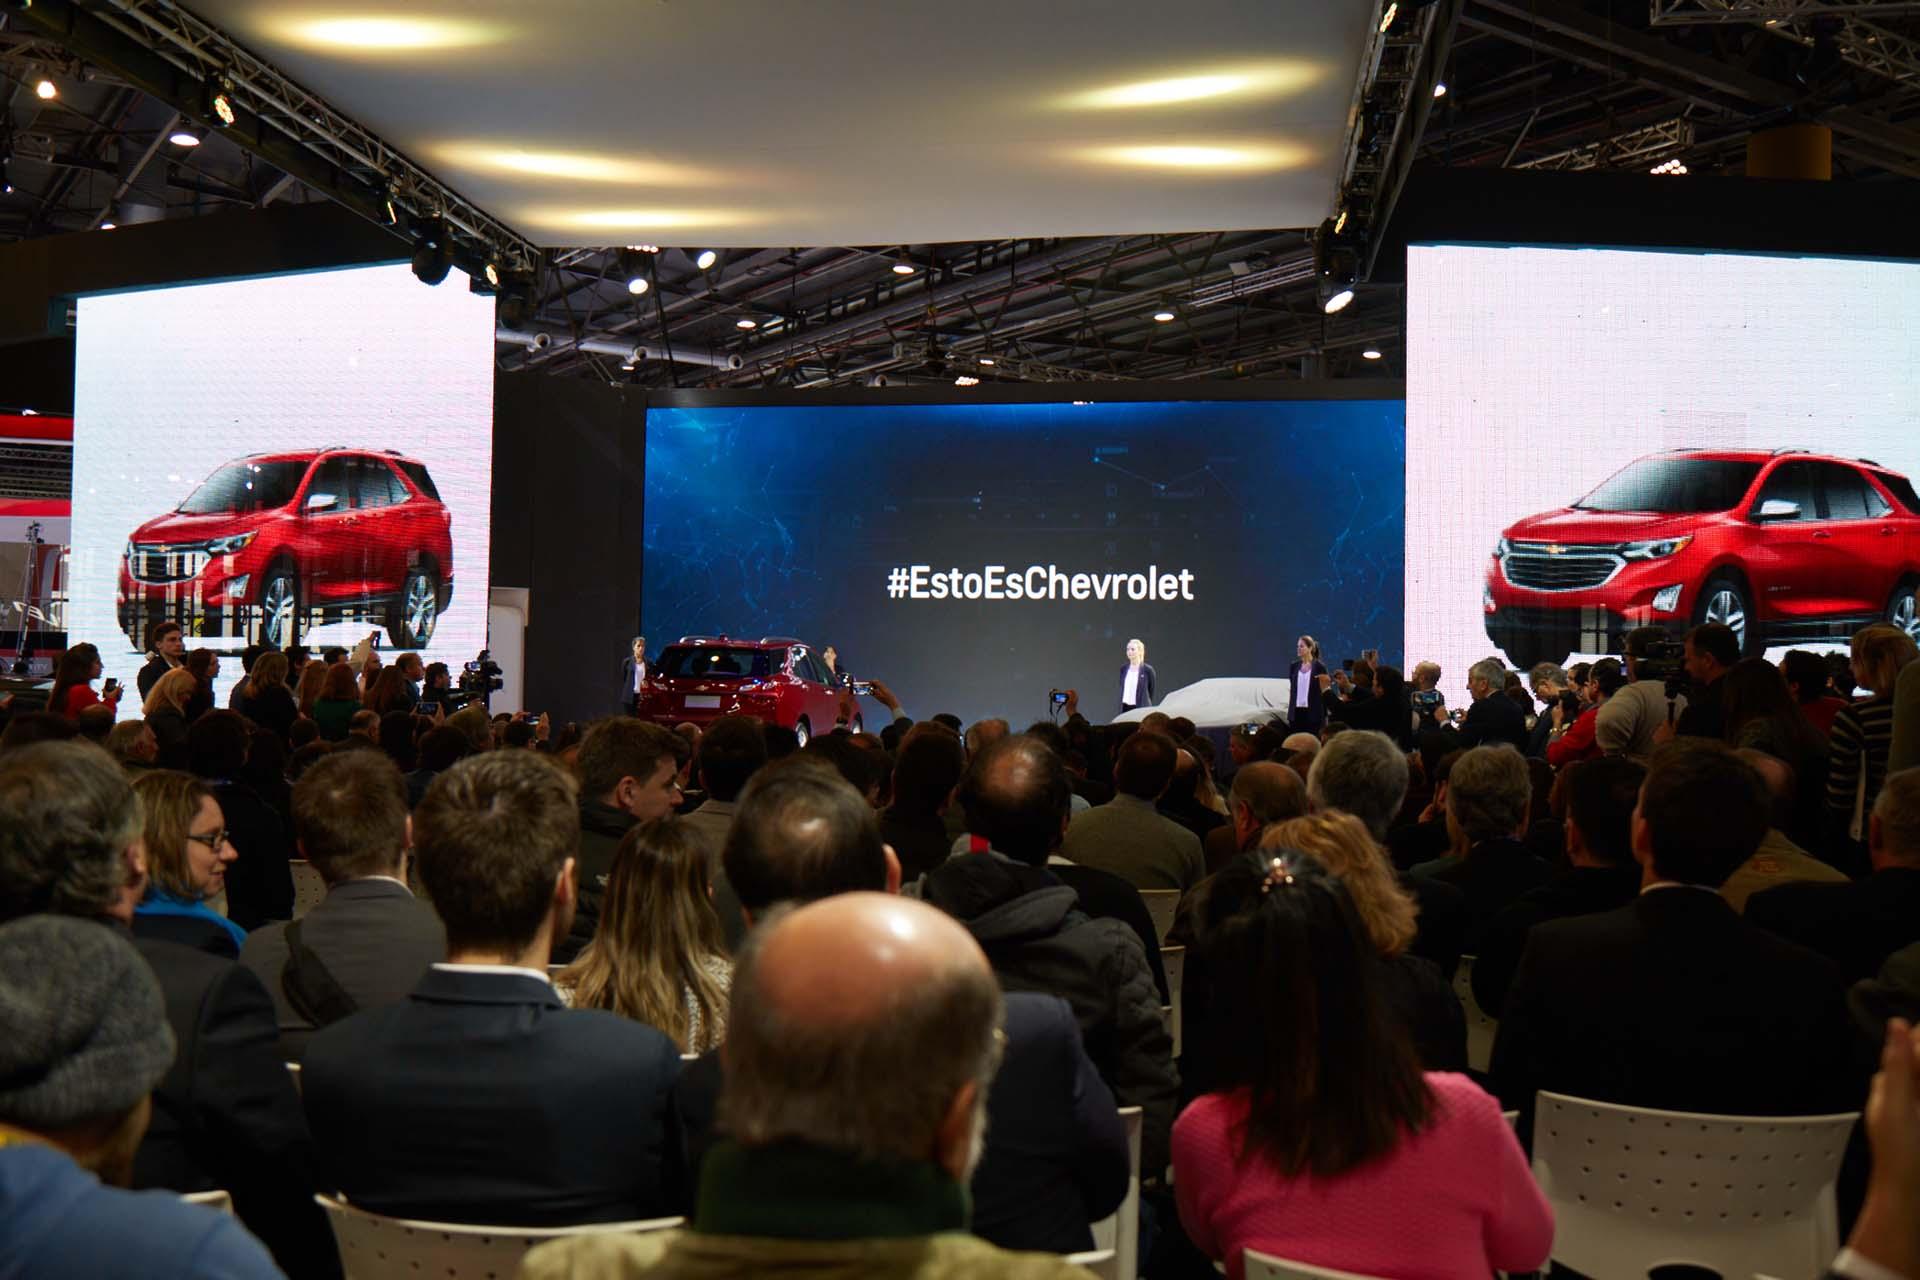 Presentación #EstoEsChevrolet (GM)